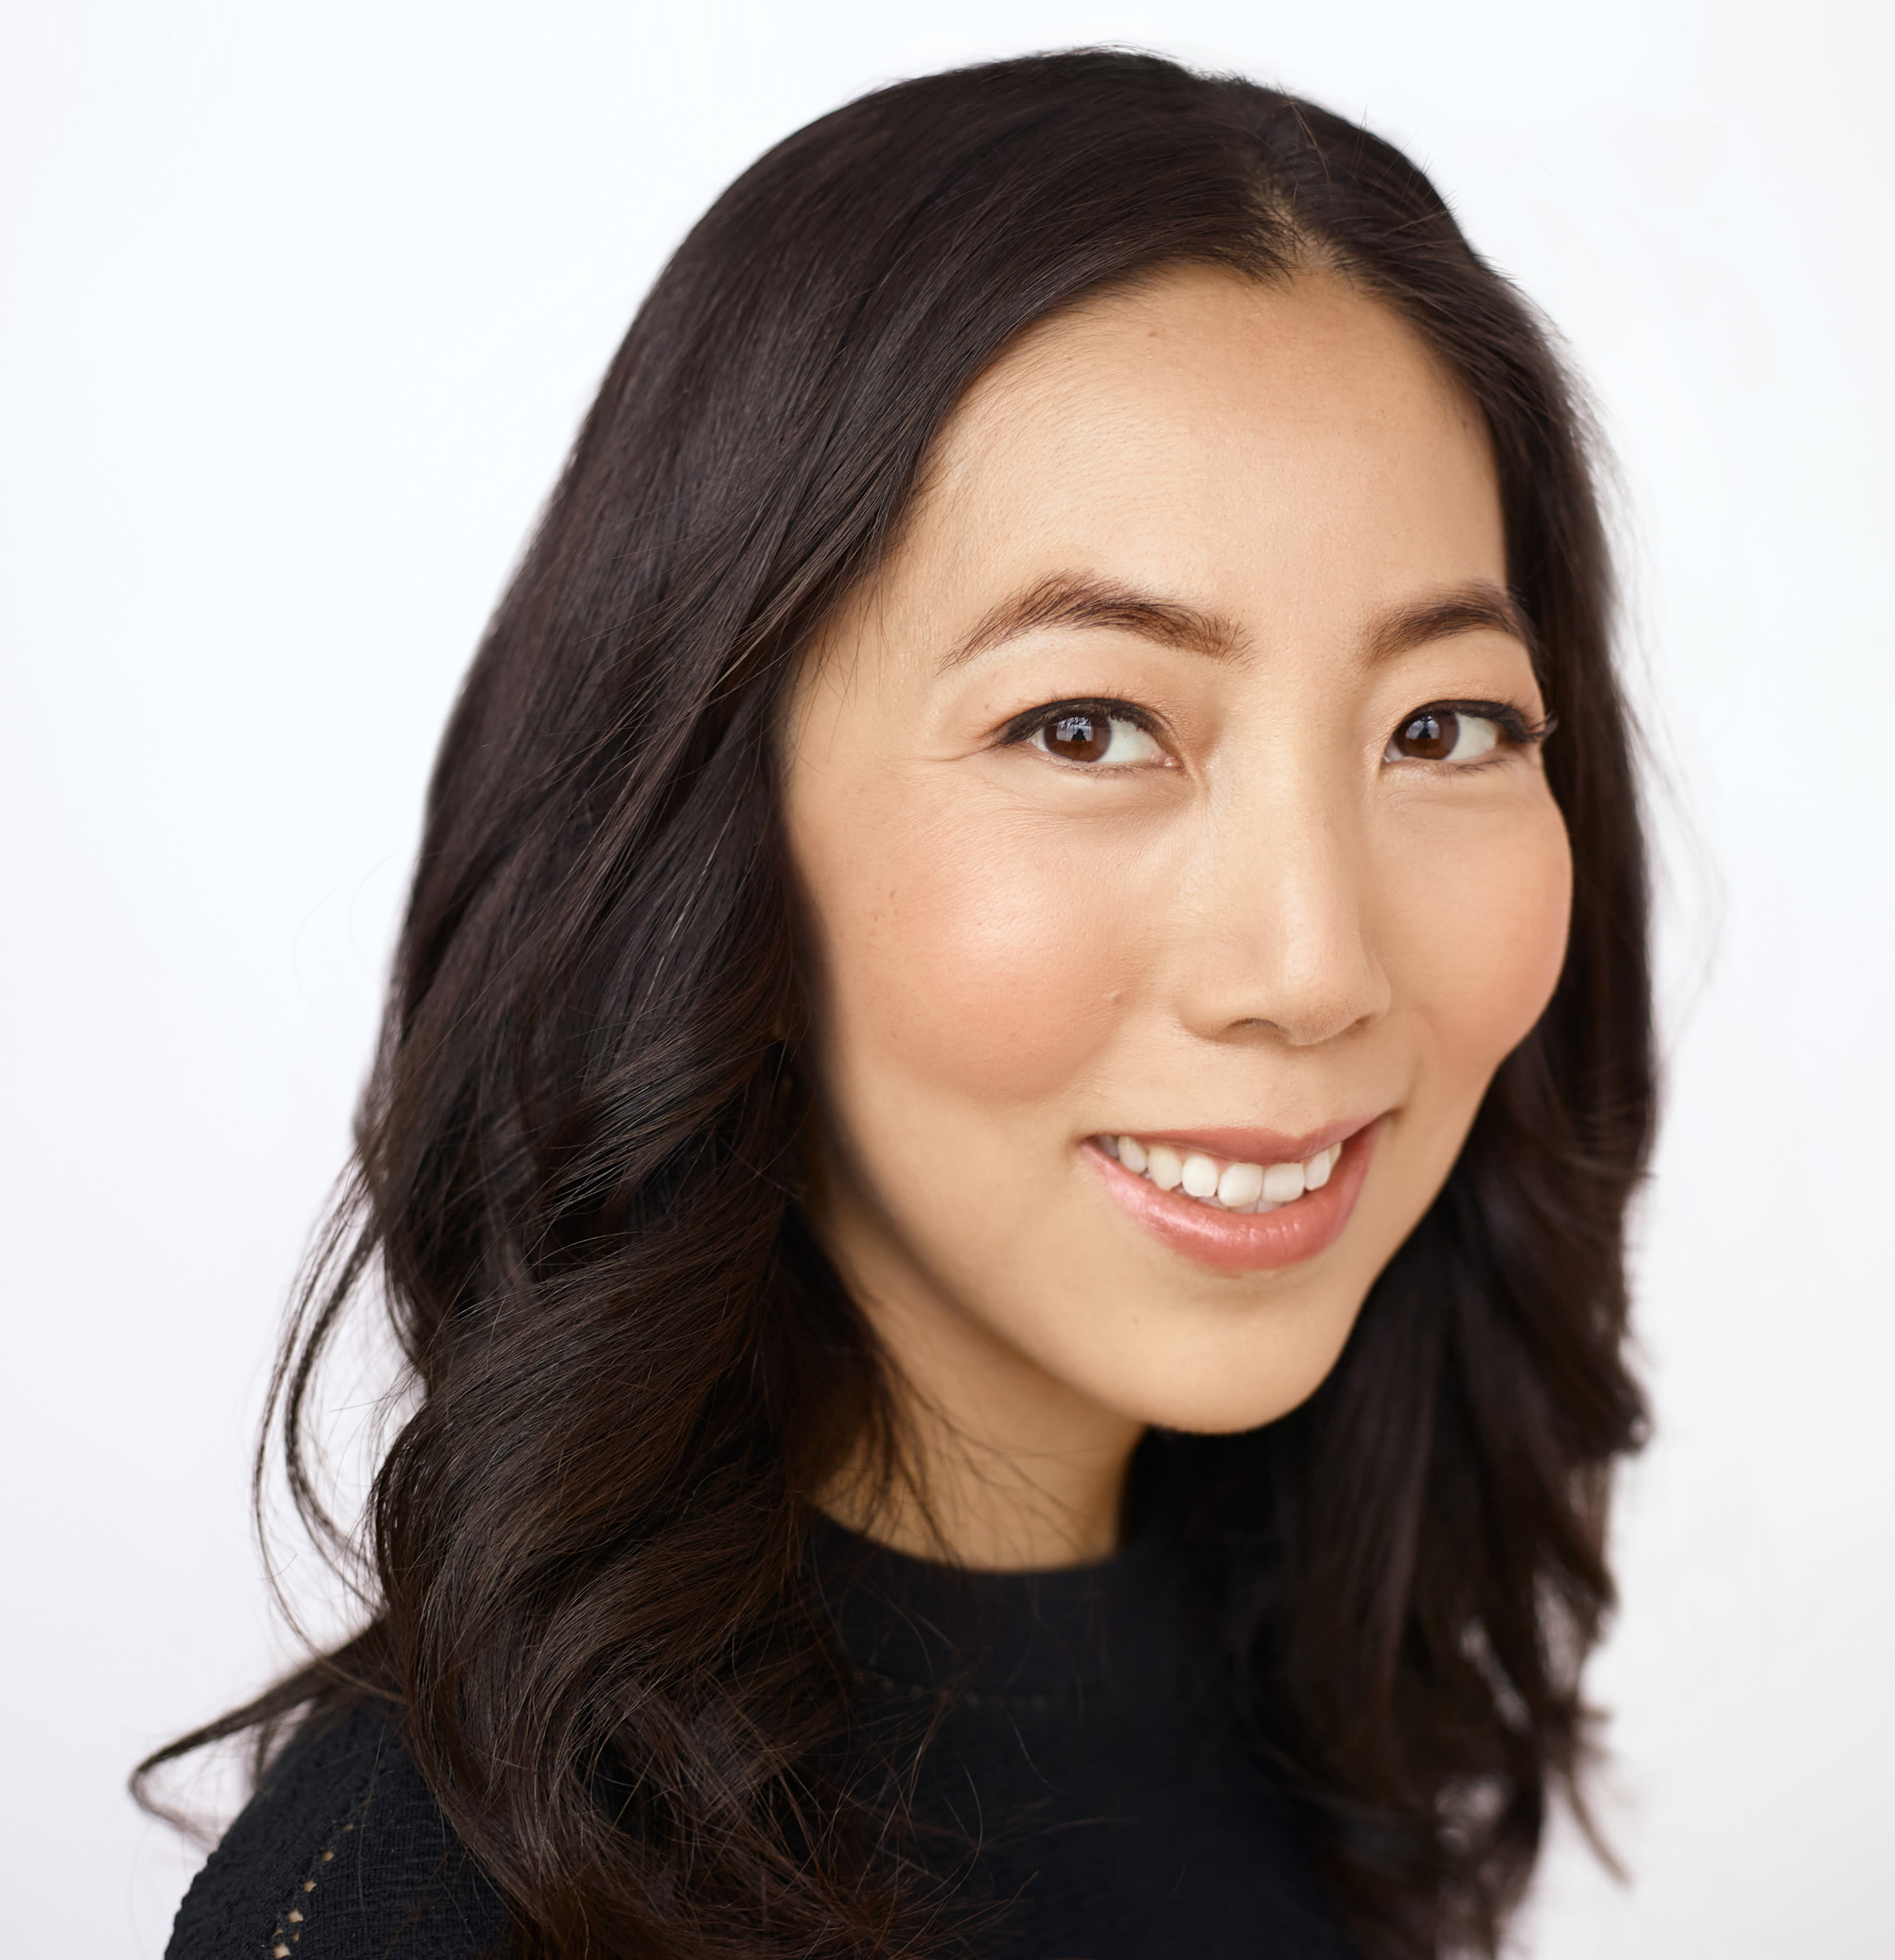 Handout: Julie Zhuo